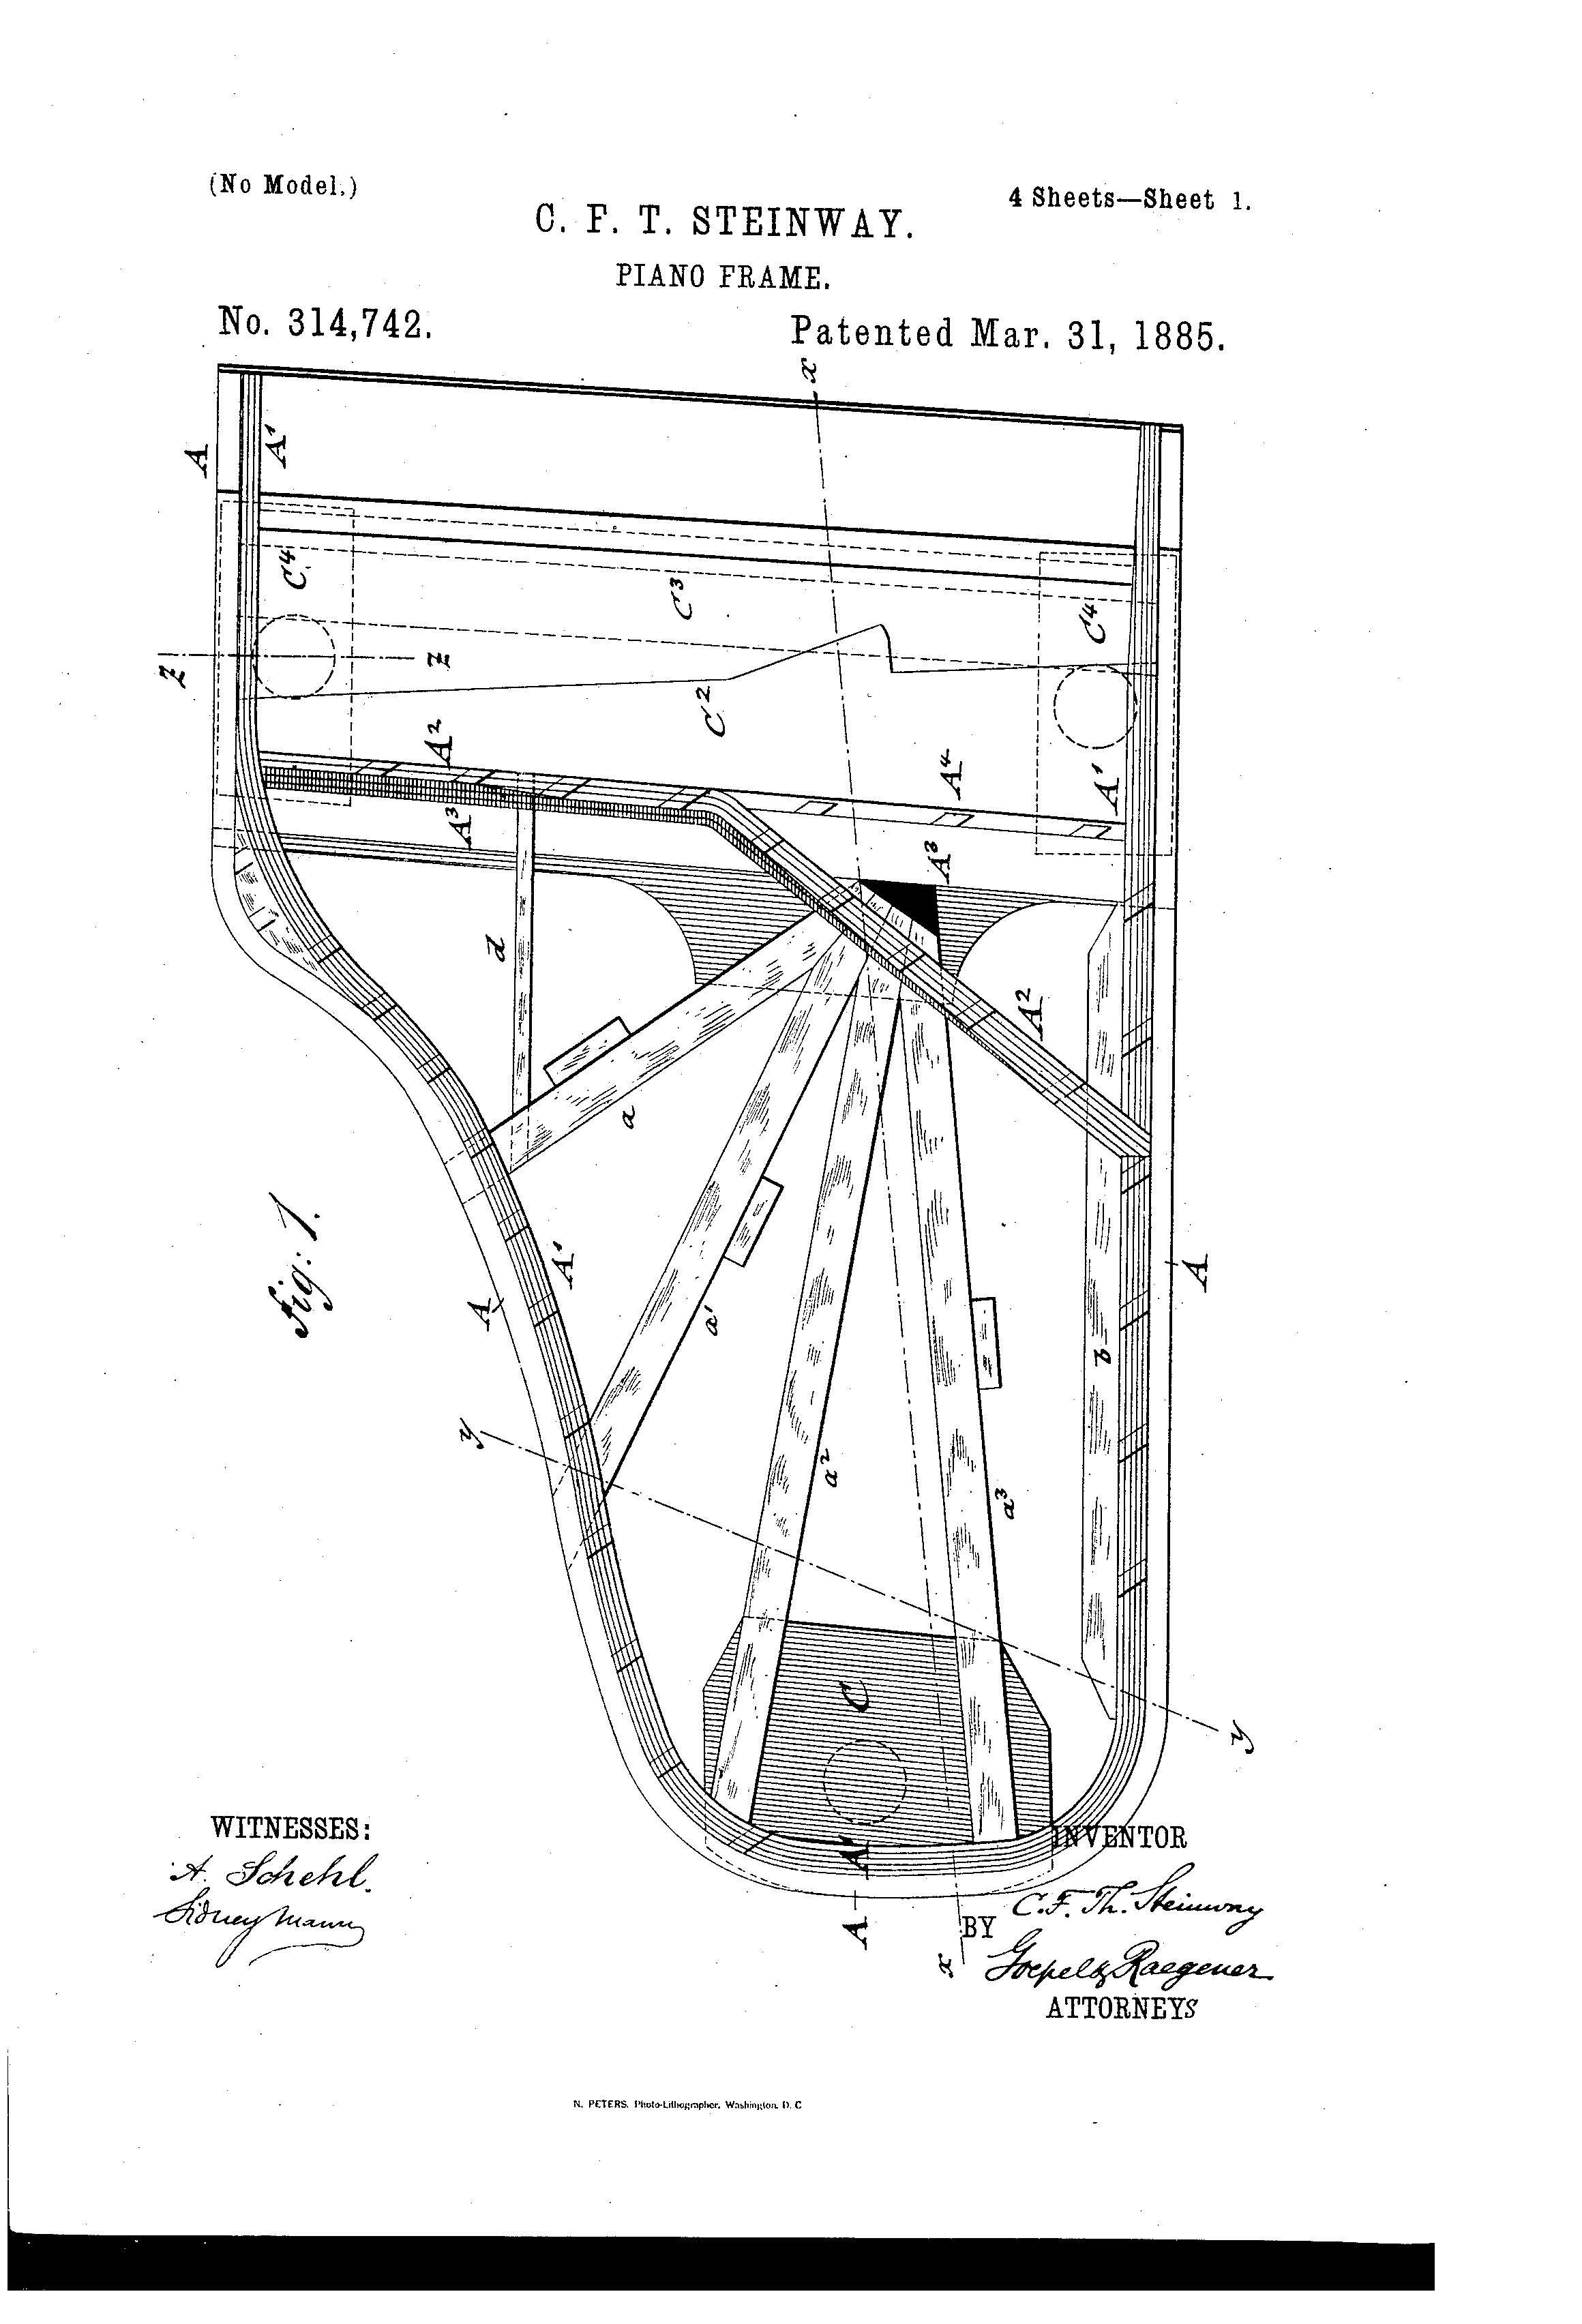 PatentIllustrationPiainoFrame Page 1